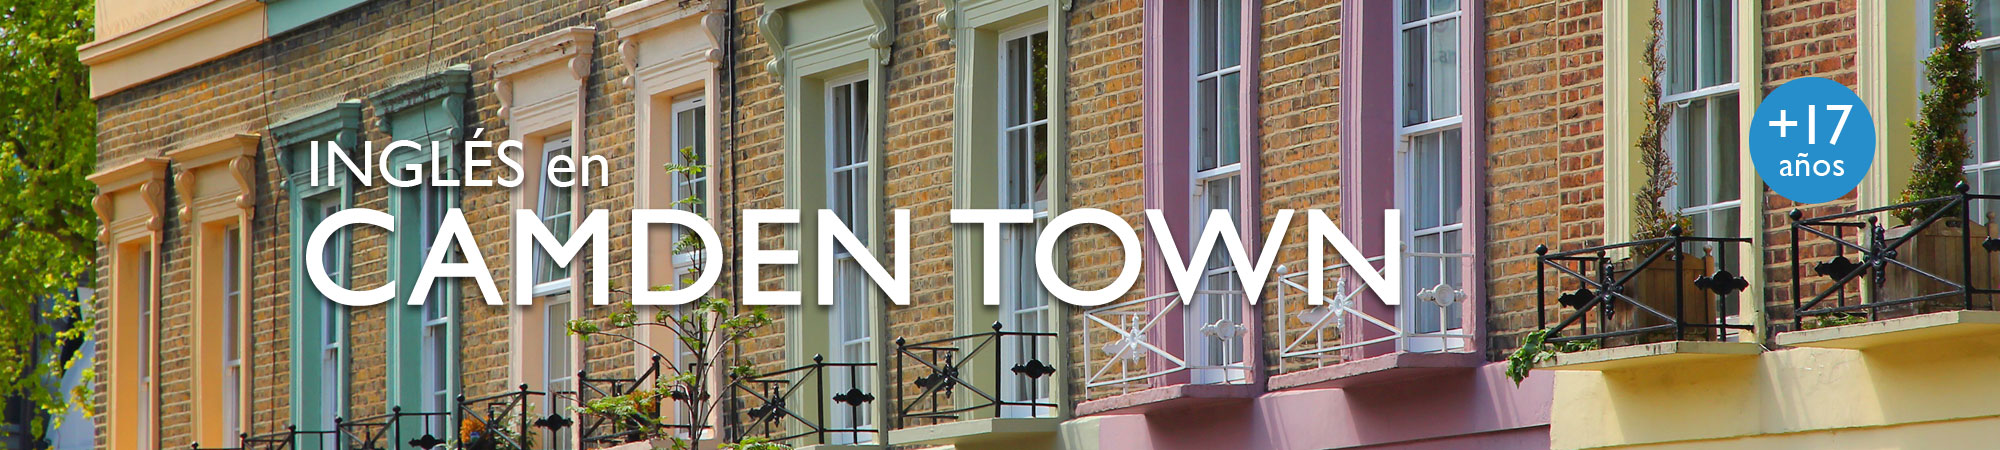 estudiar ingles en Londres en Camden town Cursos Midleton School